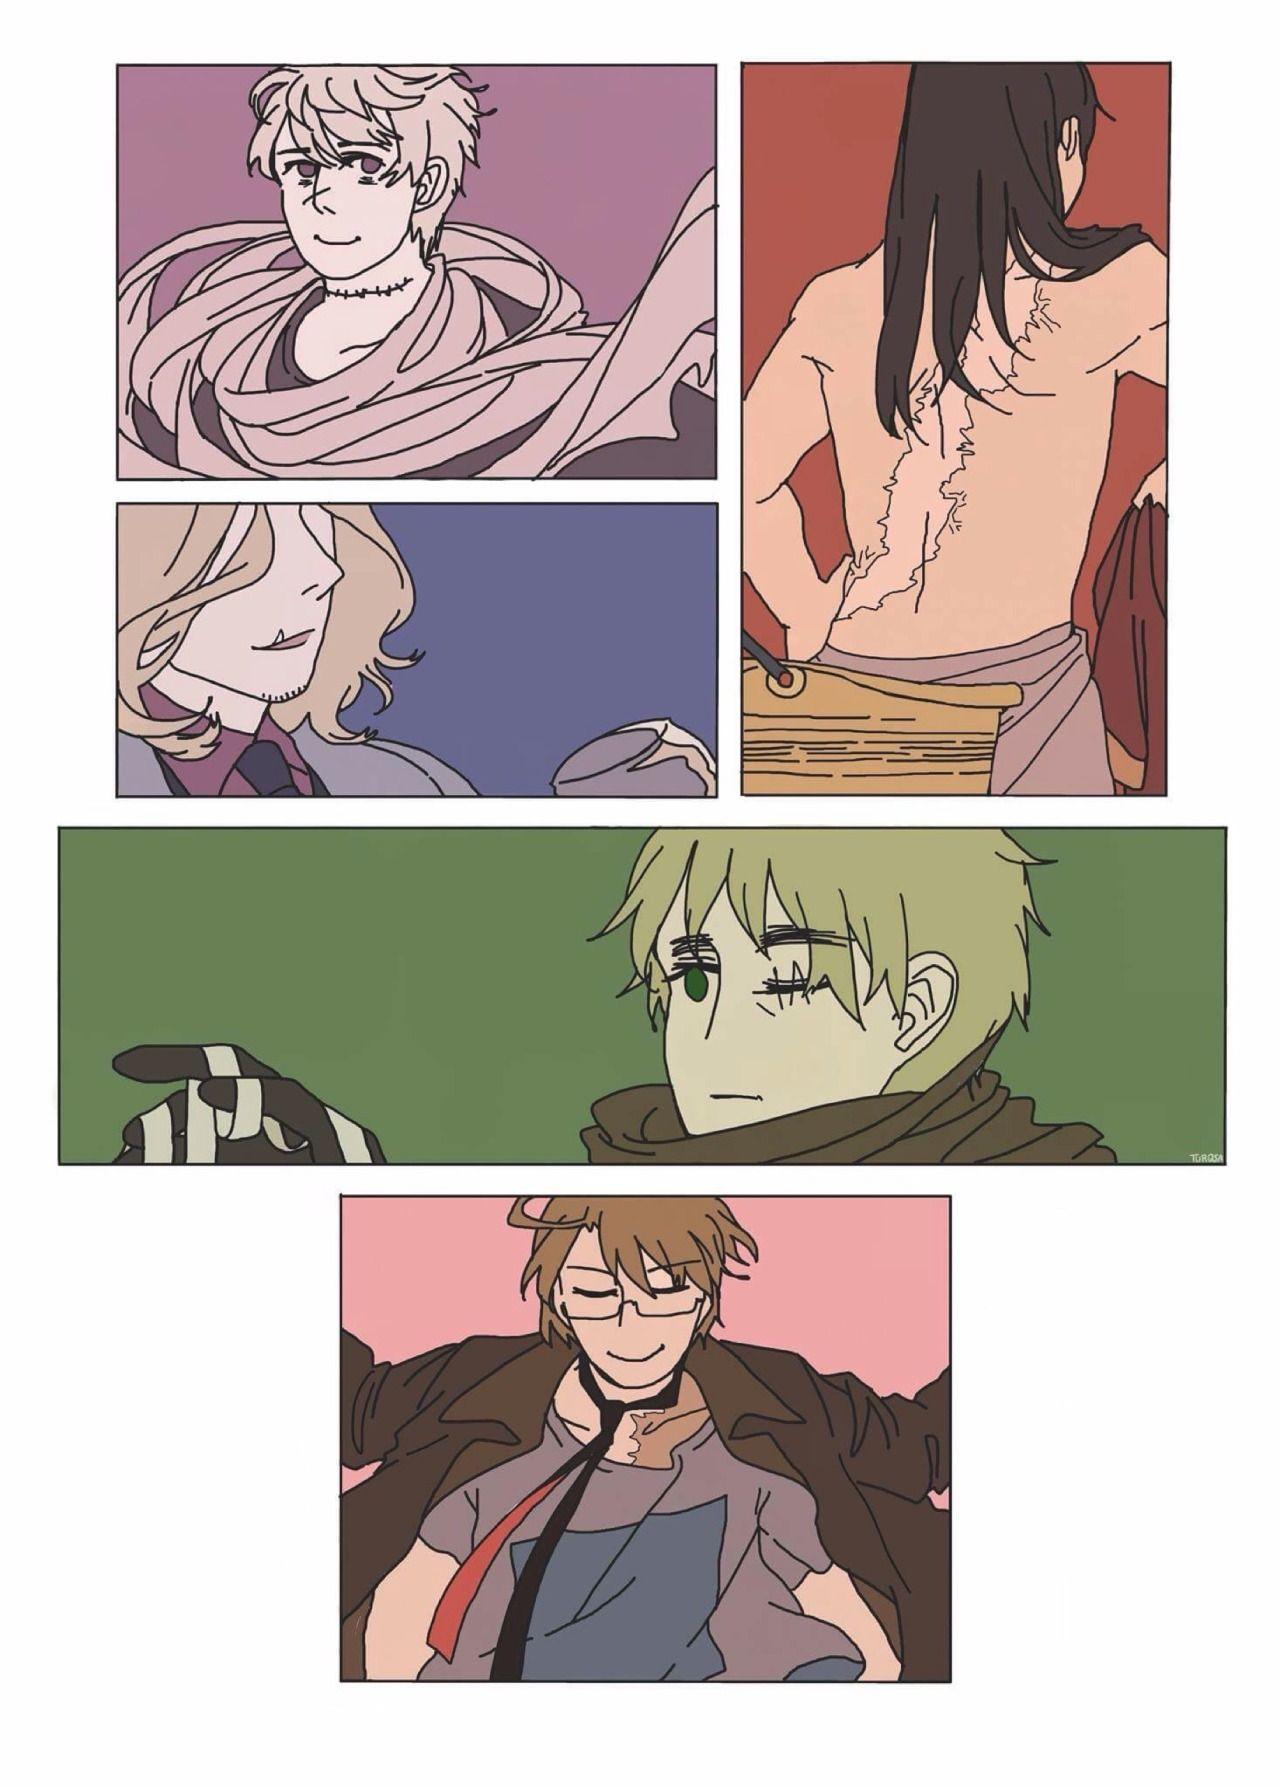 S C A R S Hetalia Characters Hetalia Anime Love